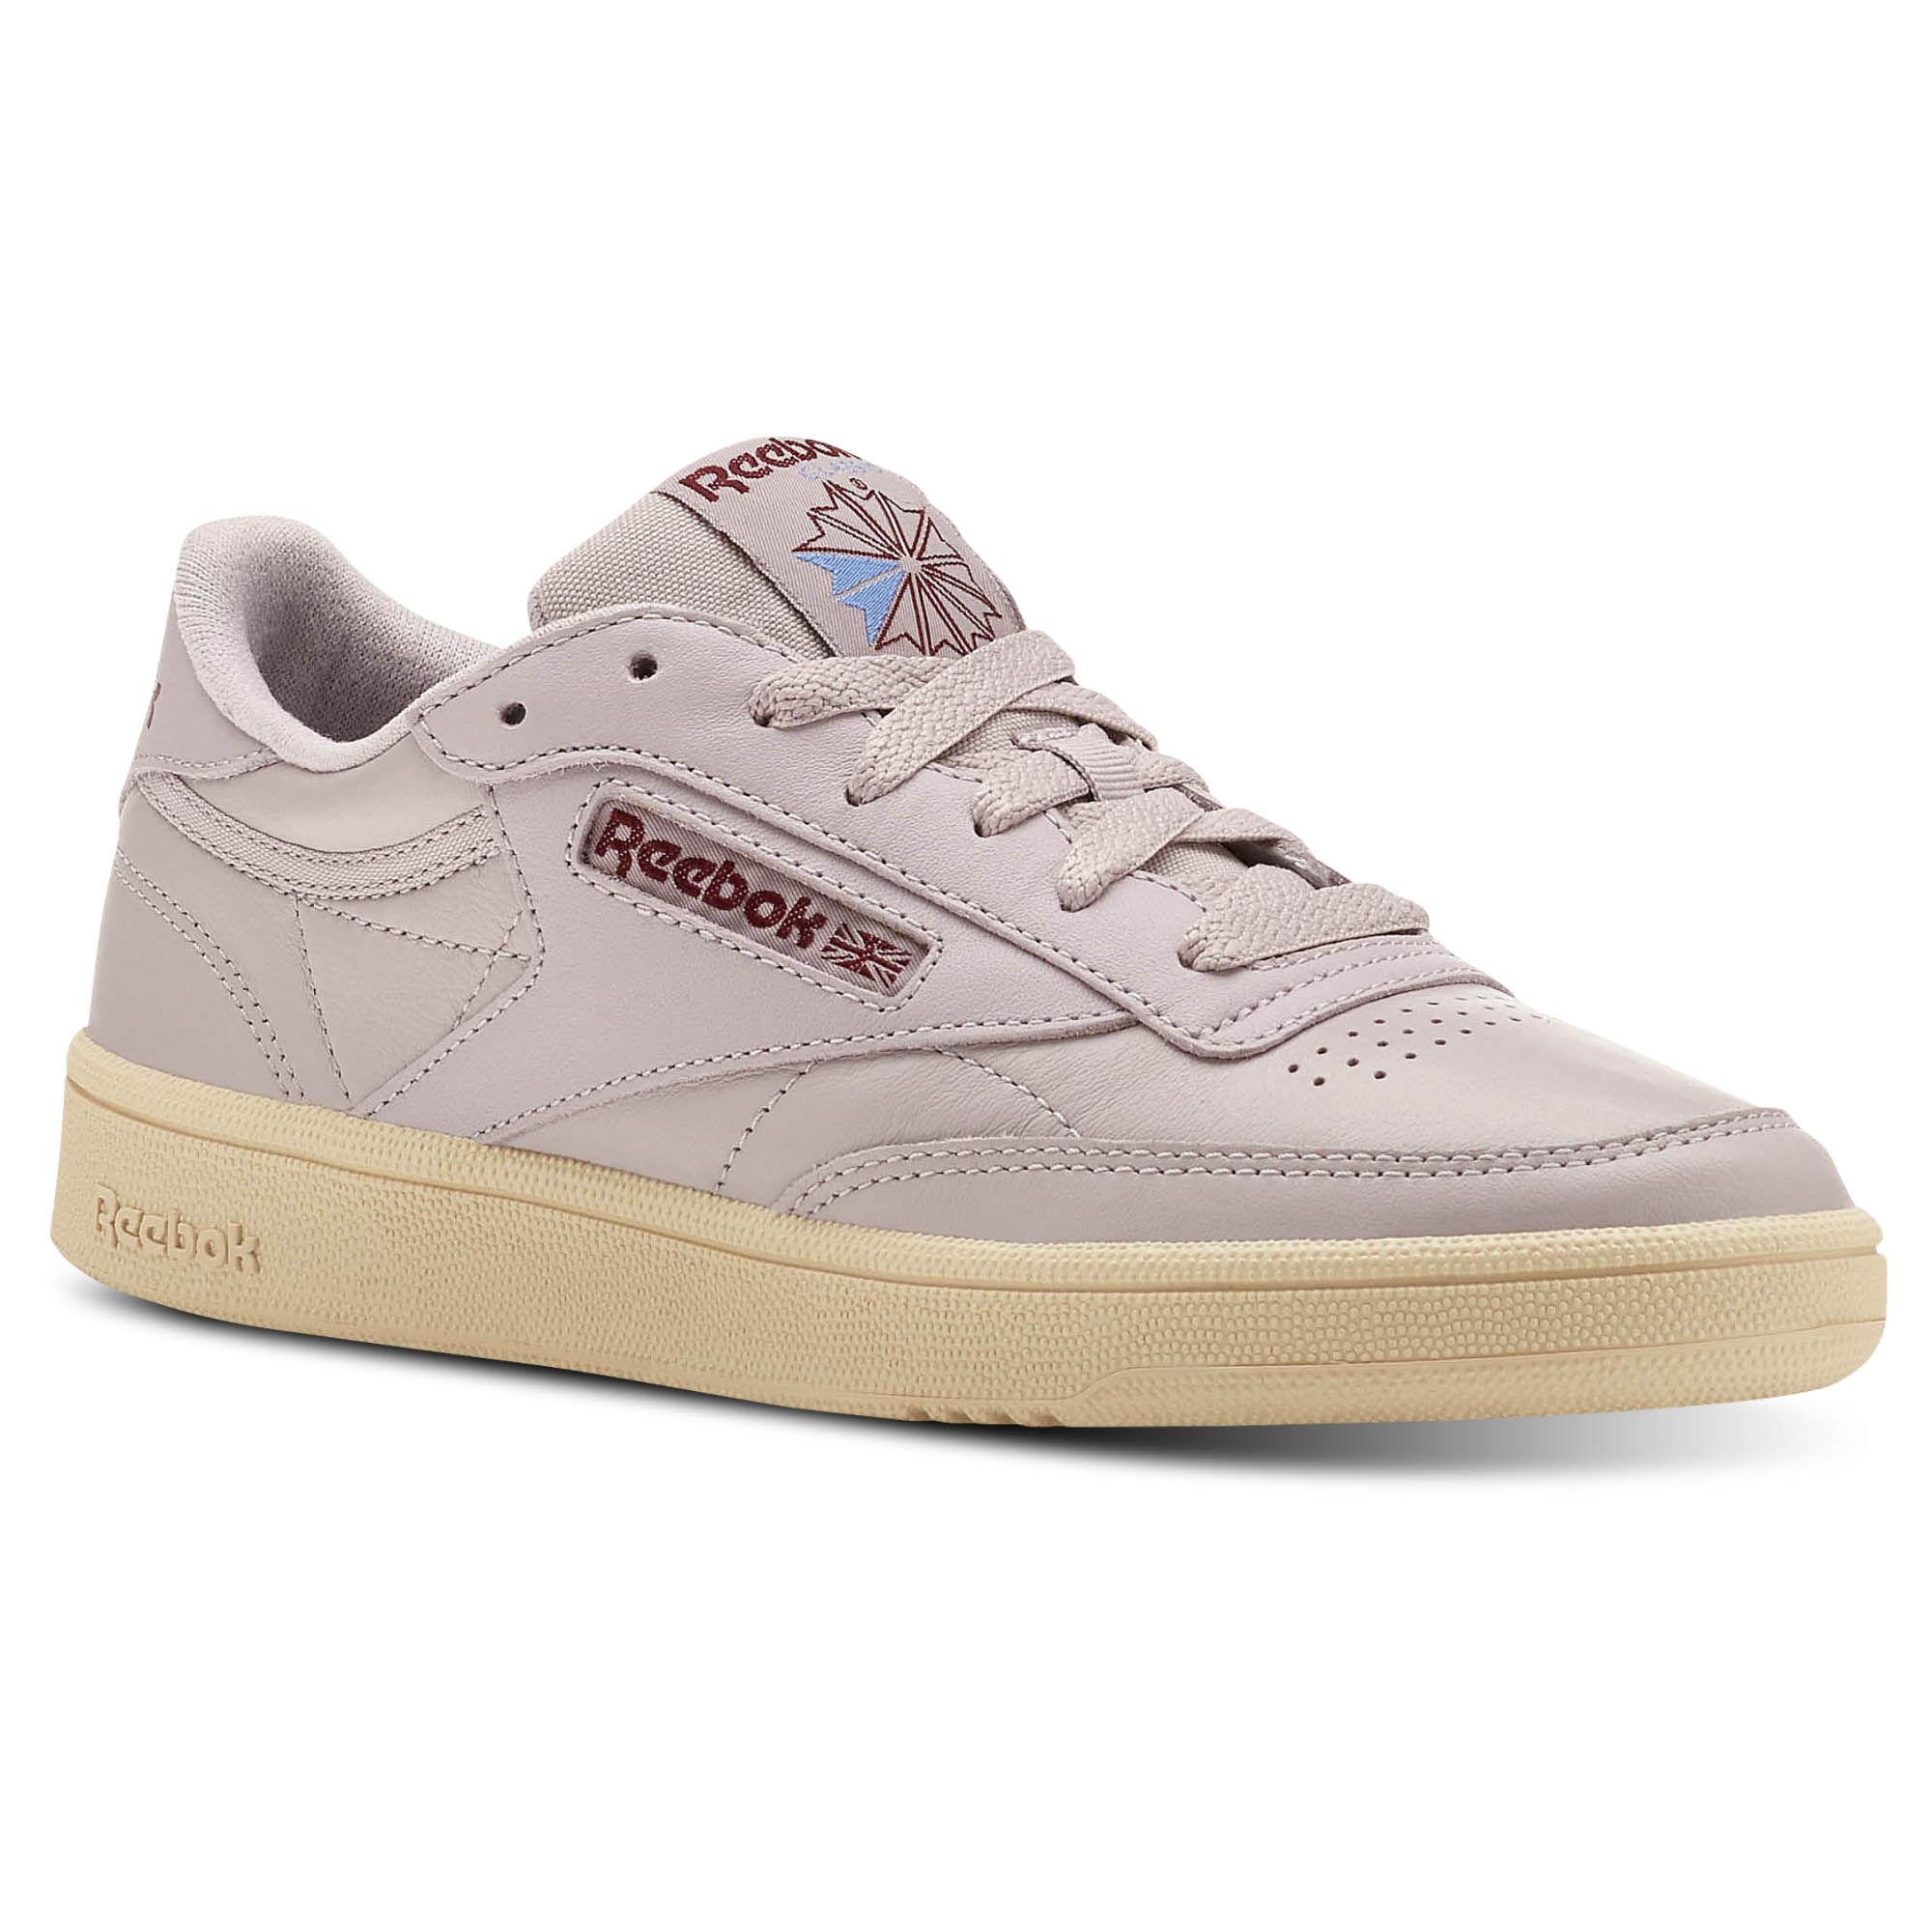 Schuhe Reebok - Club C 85 CN5658 Mid/Opal qP8GY2pr